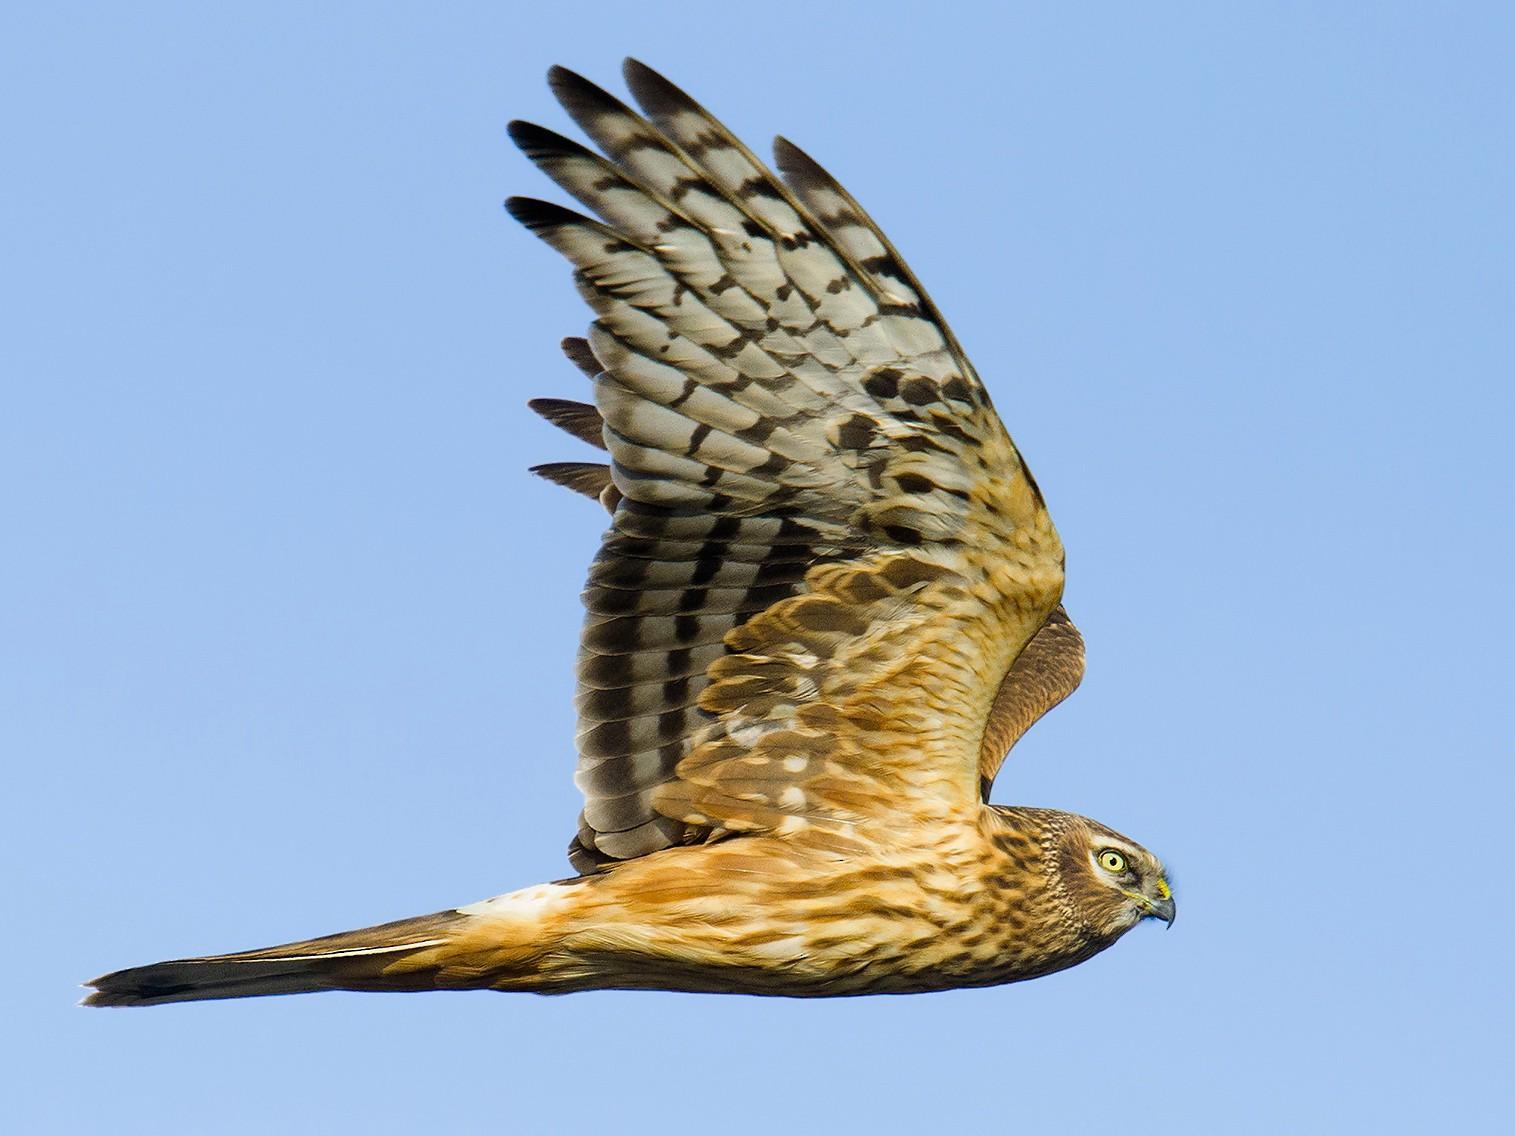 Hen Harrier - Craig Brelsford